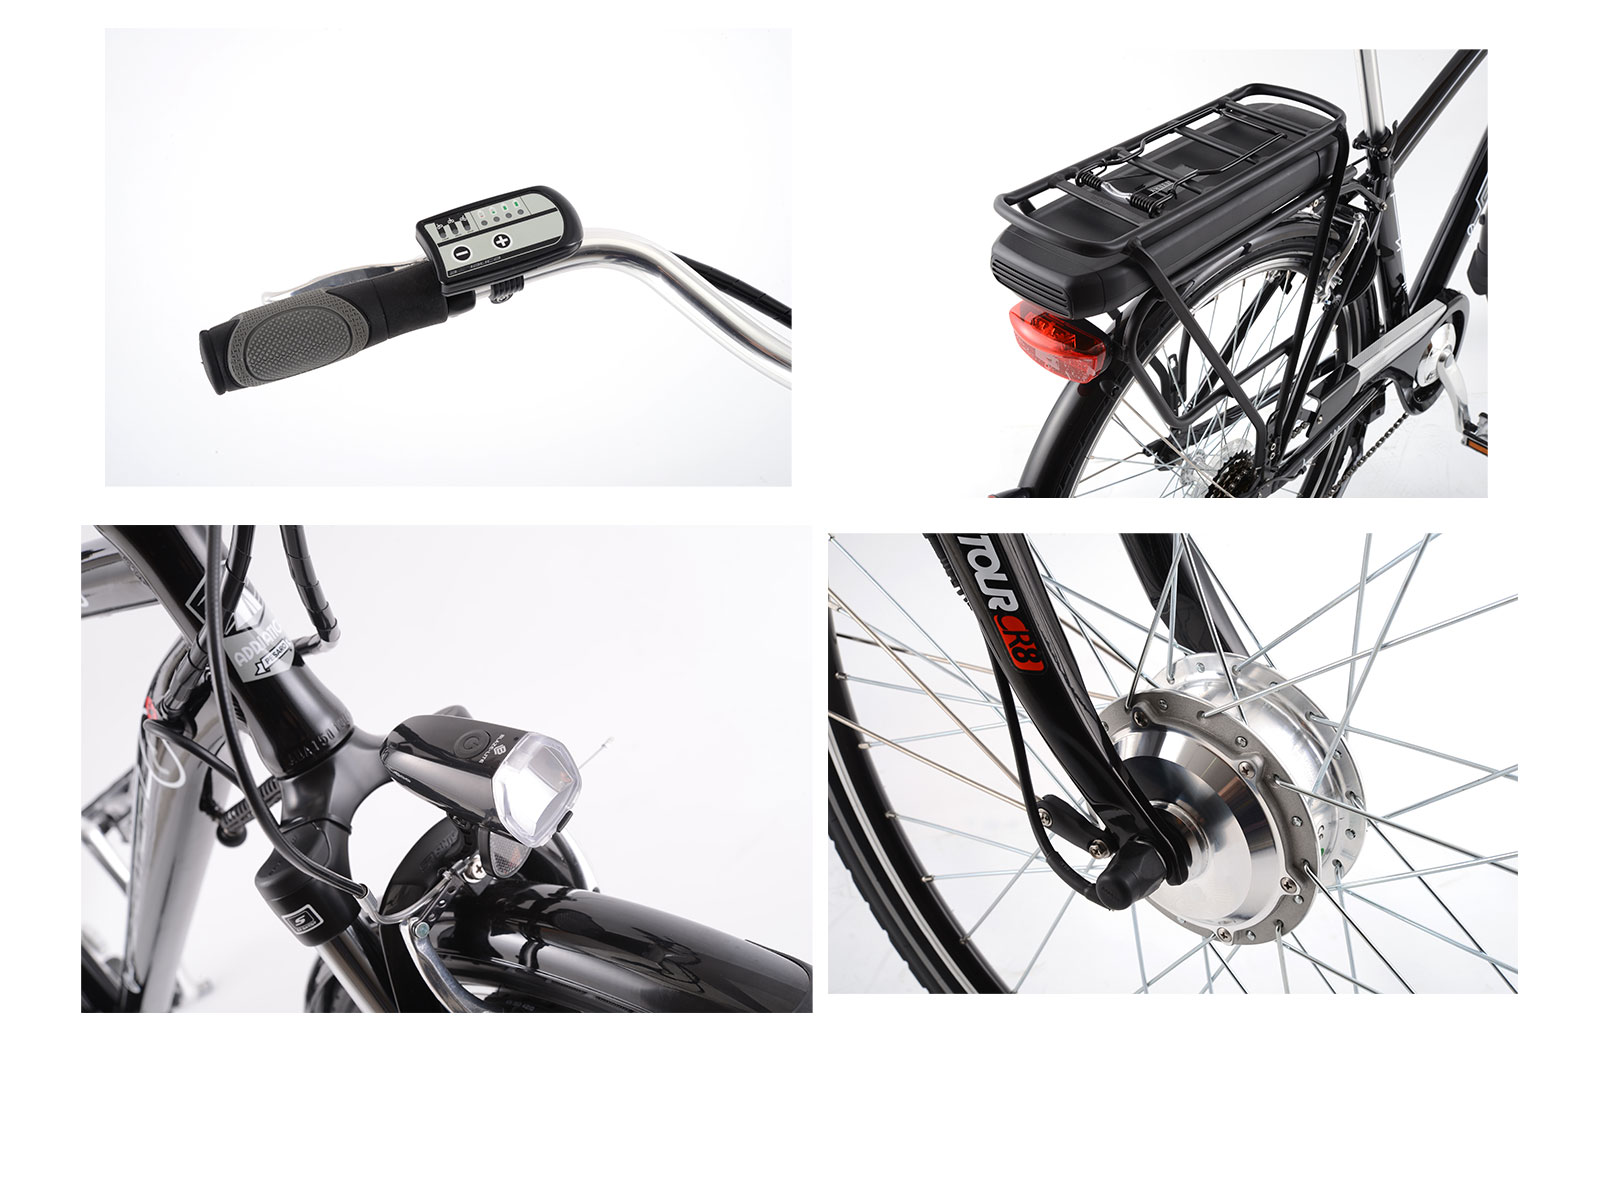 e-bike-uomo-neroa-details